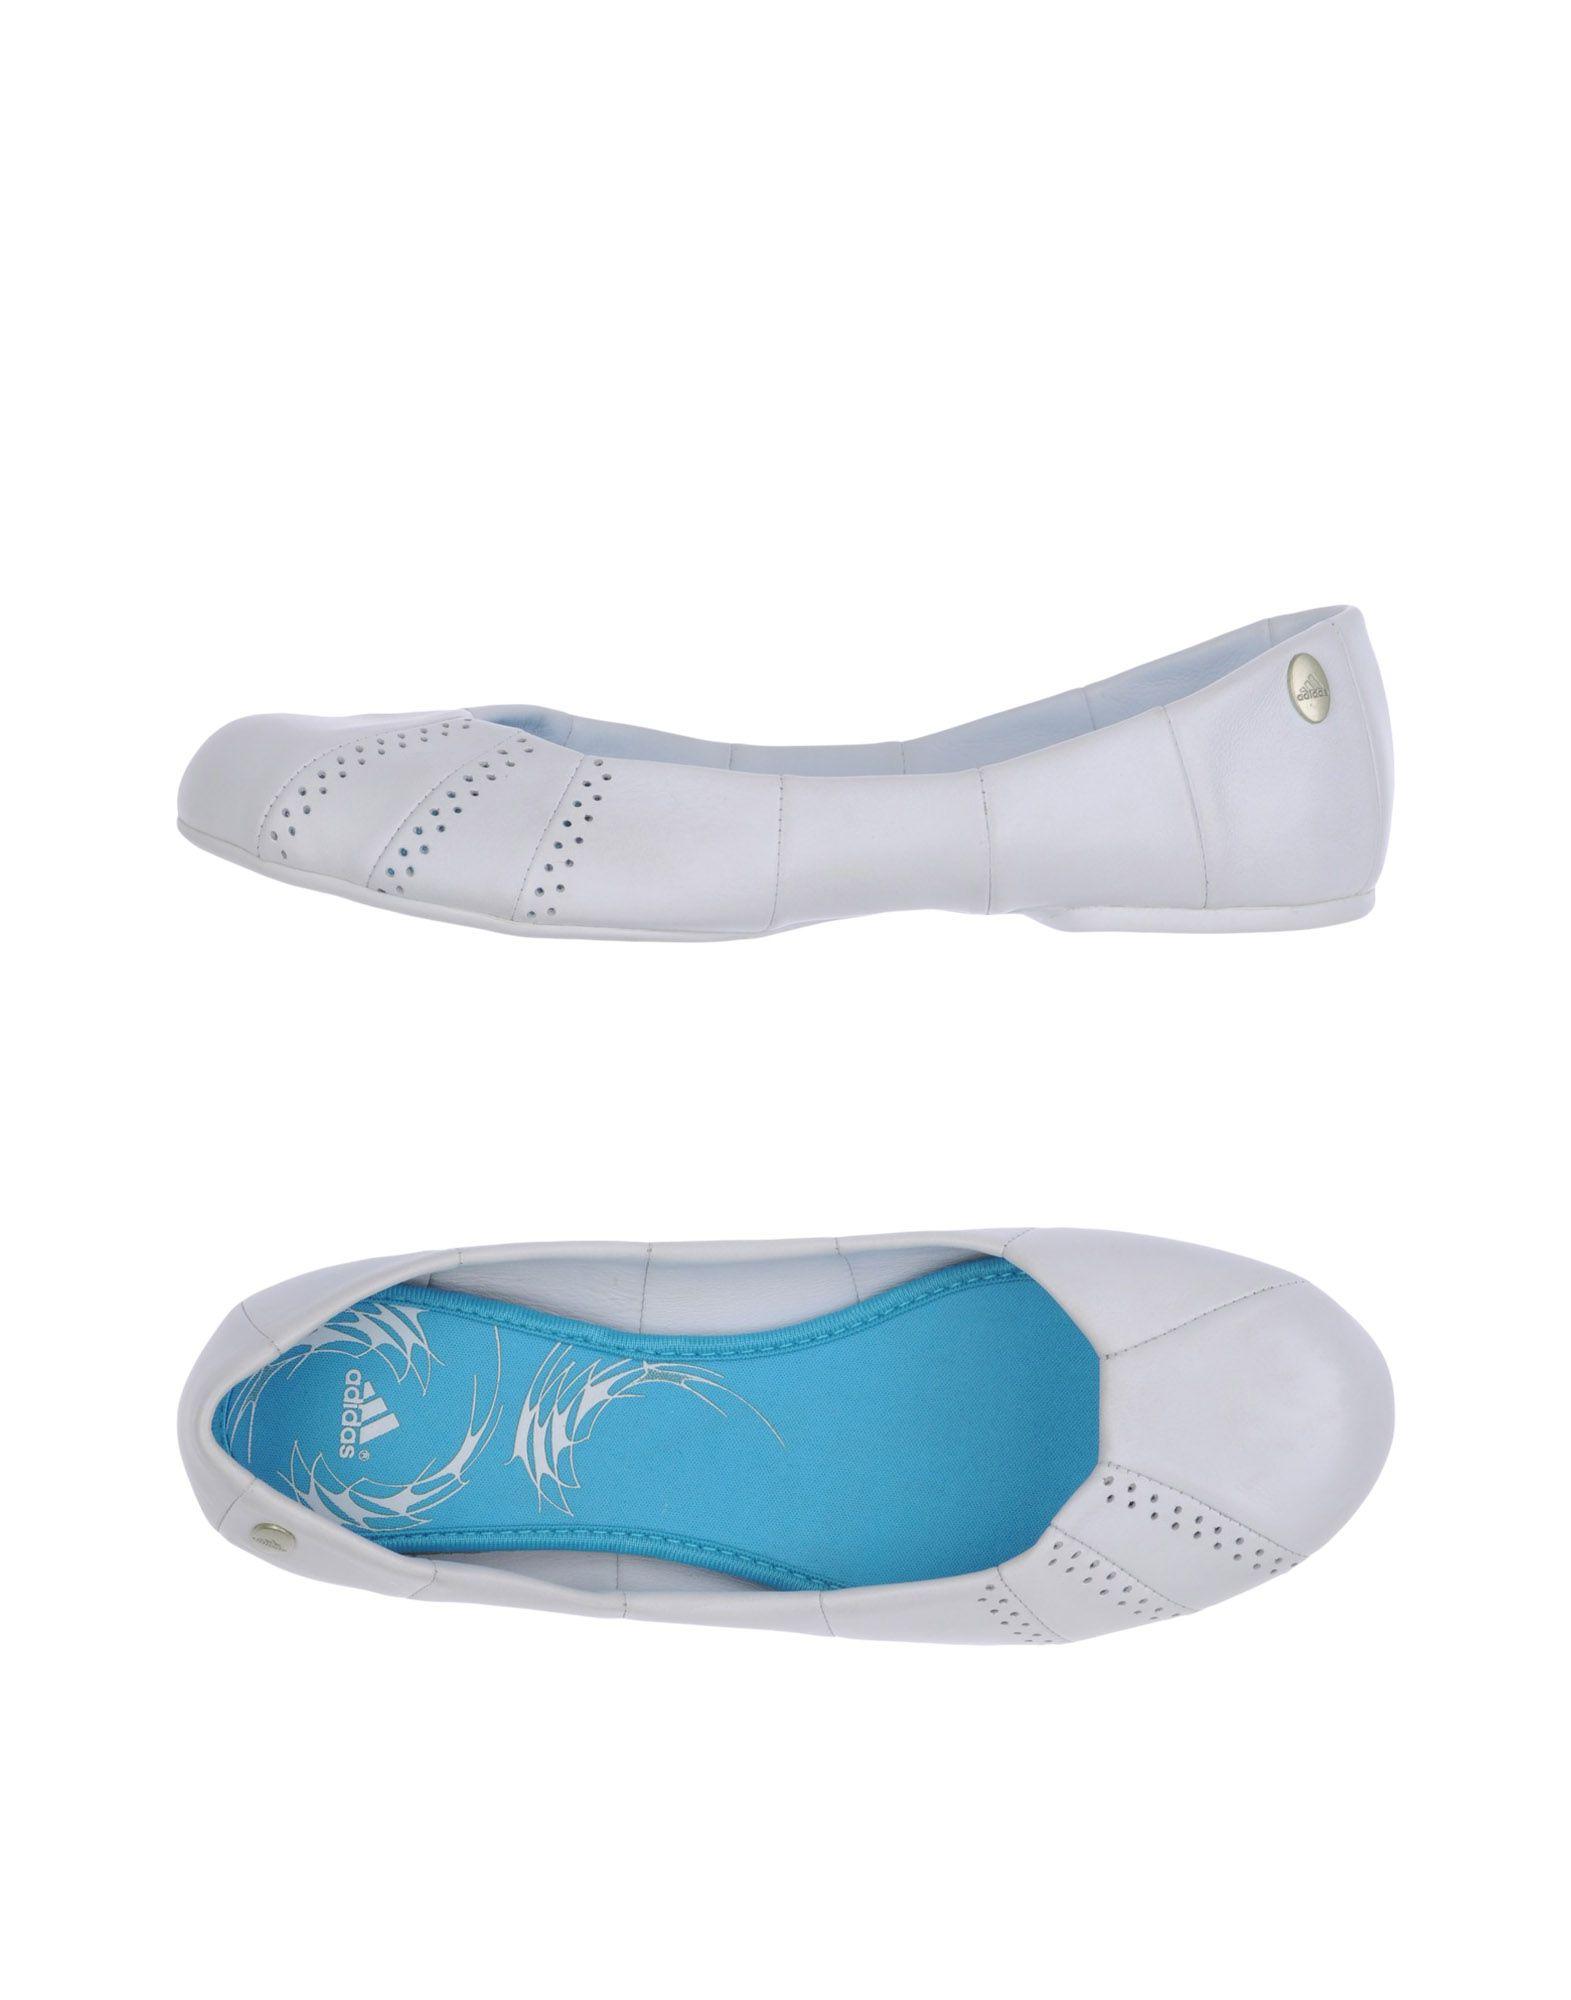 Moda Ballerine Adidas Donna - 11305325VF